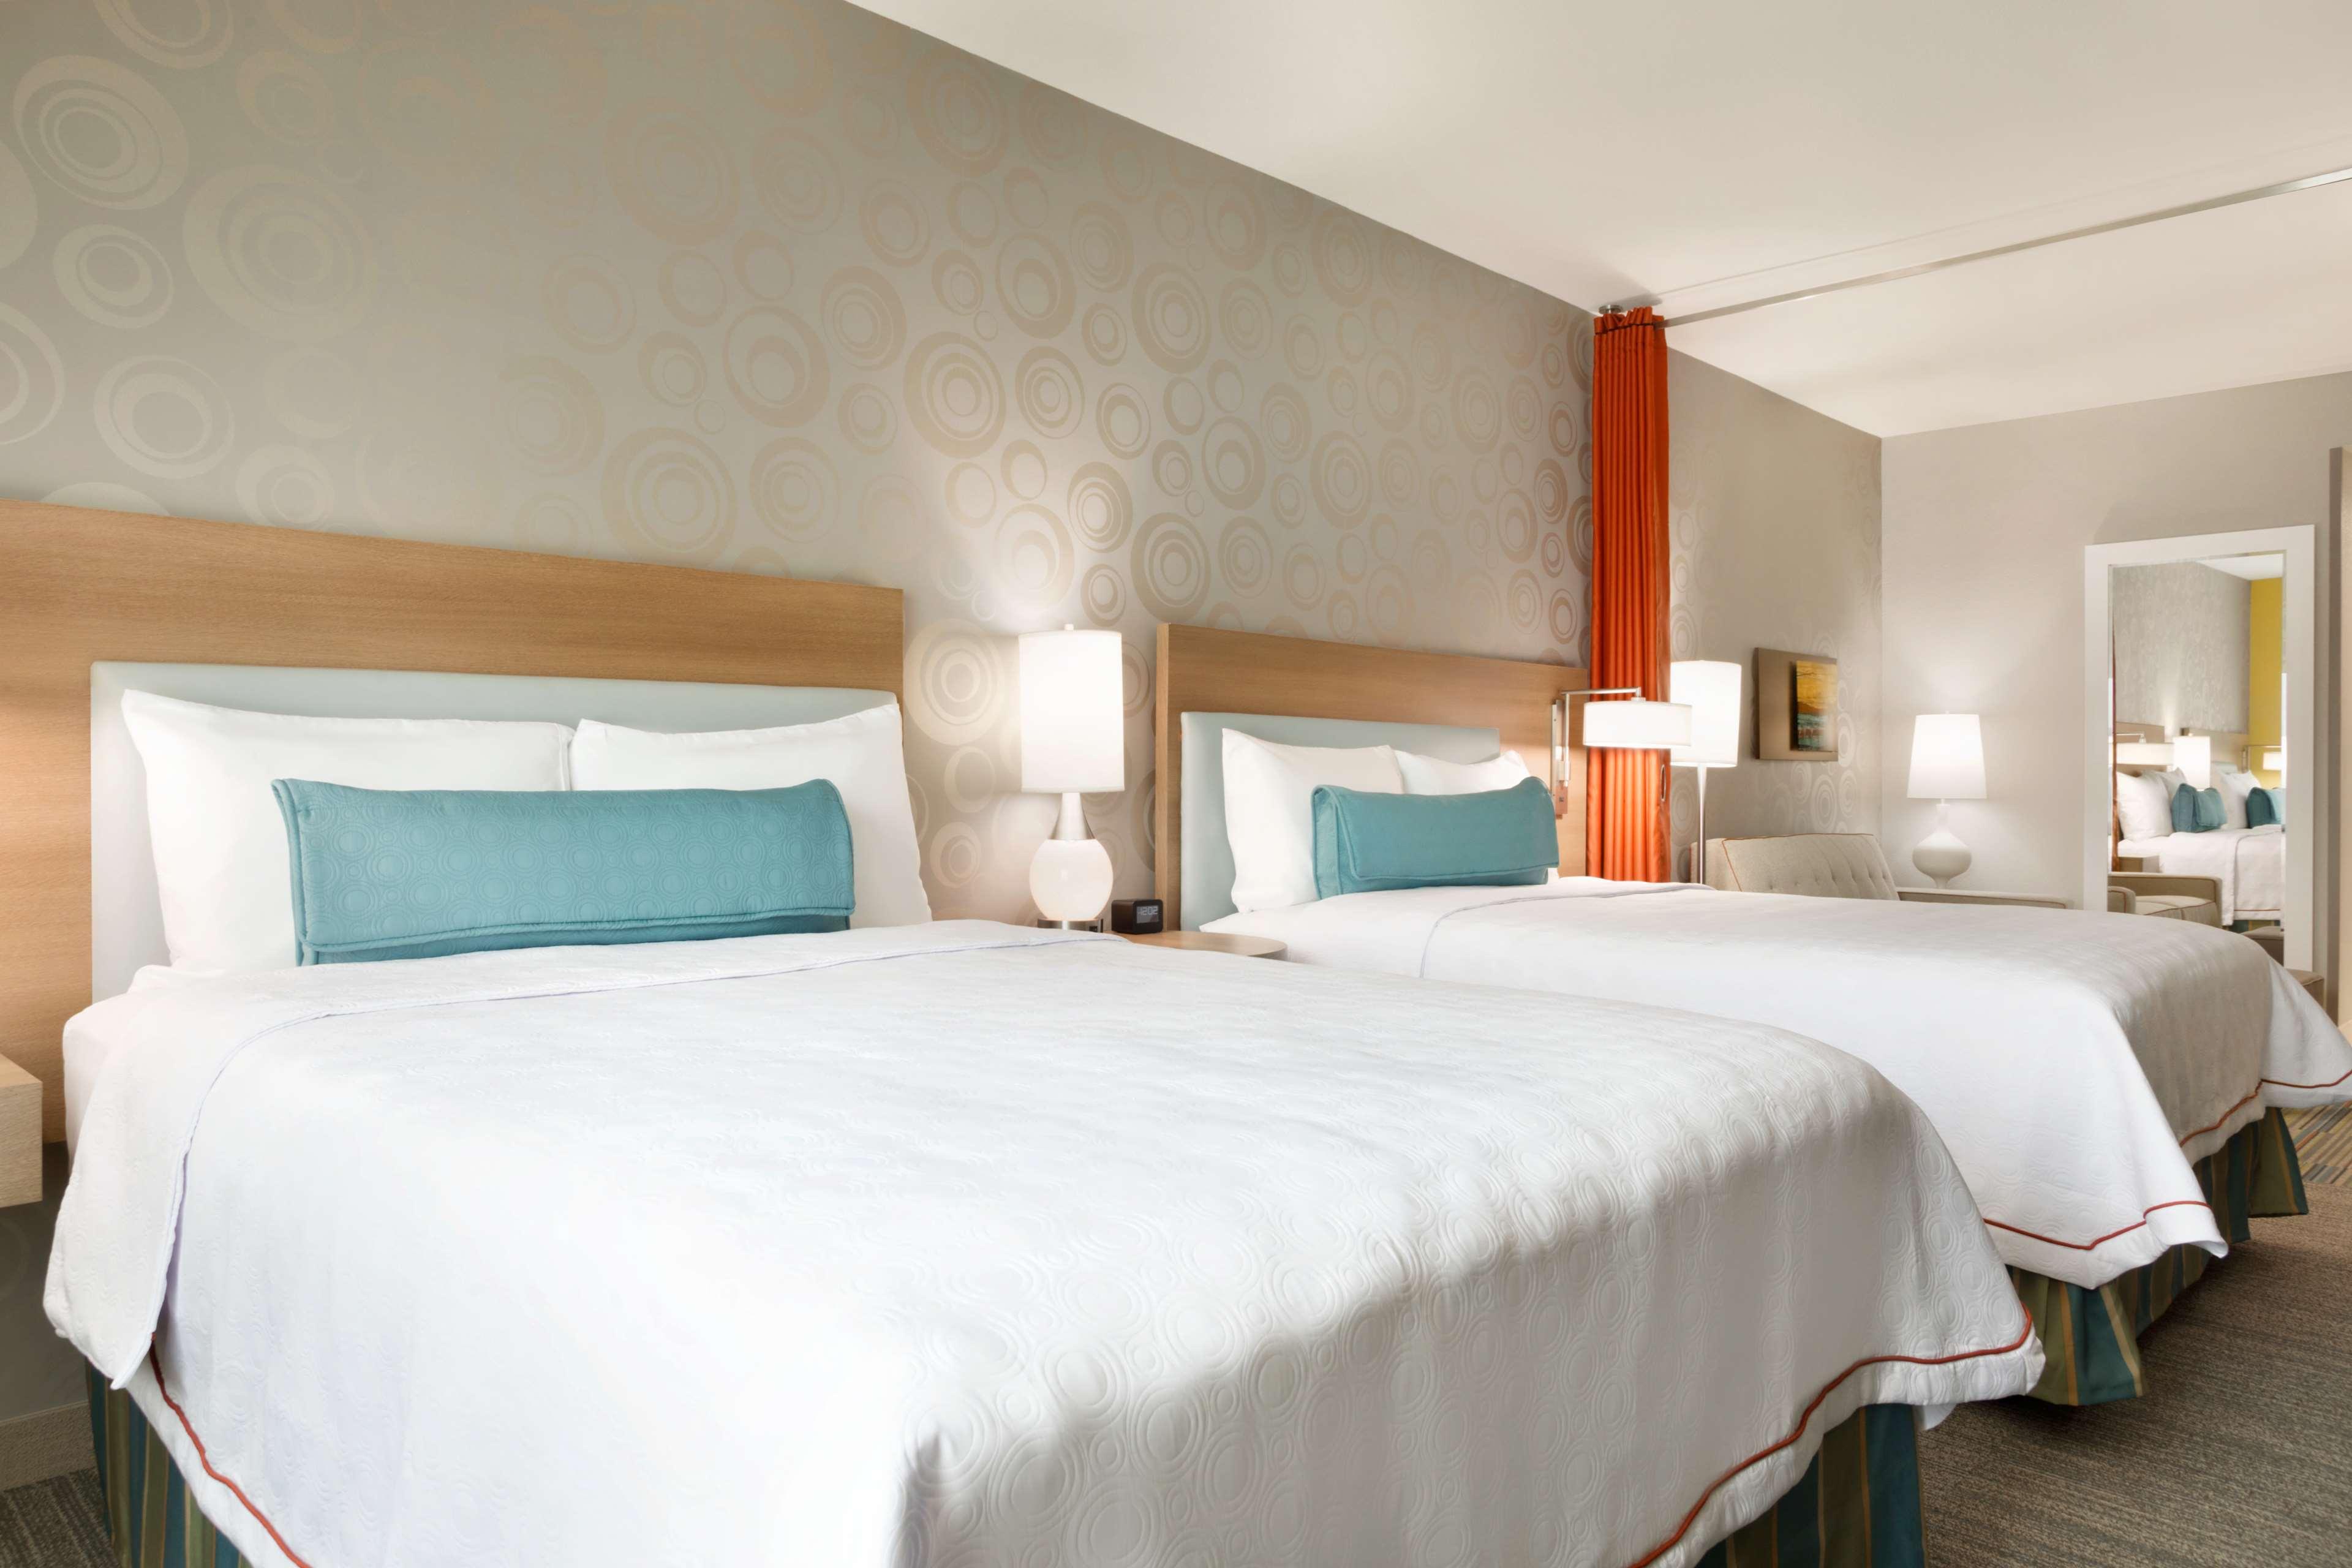 Home2 Suites by Hilton Houston/Webster image 16